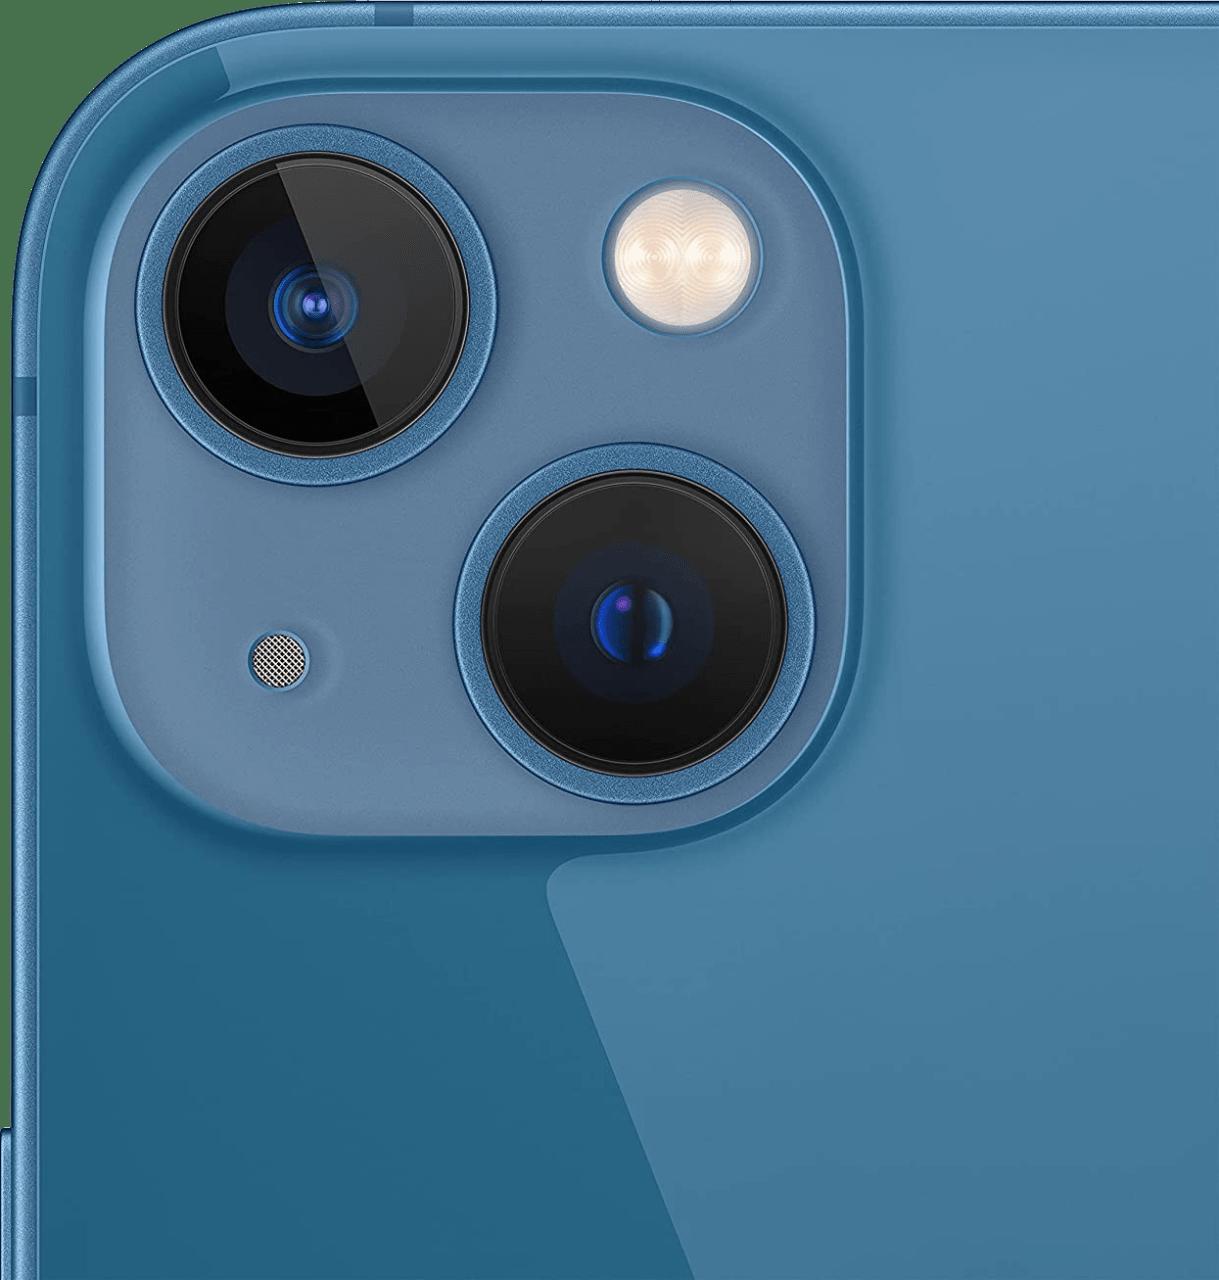 Blau Apple iPhone 13 mini - 256GB - Dual SIM.3